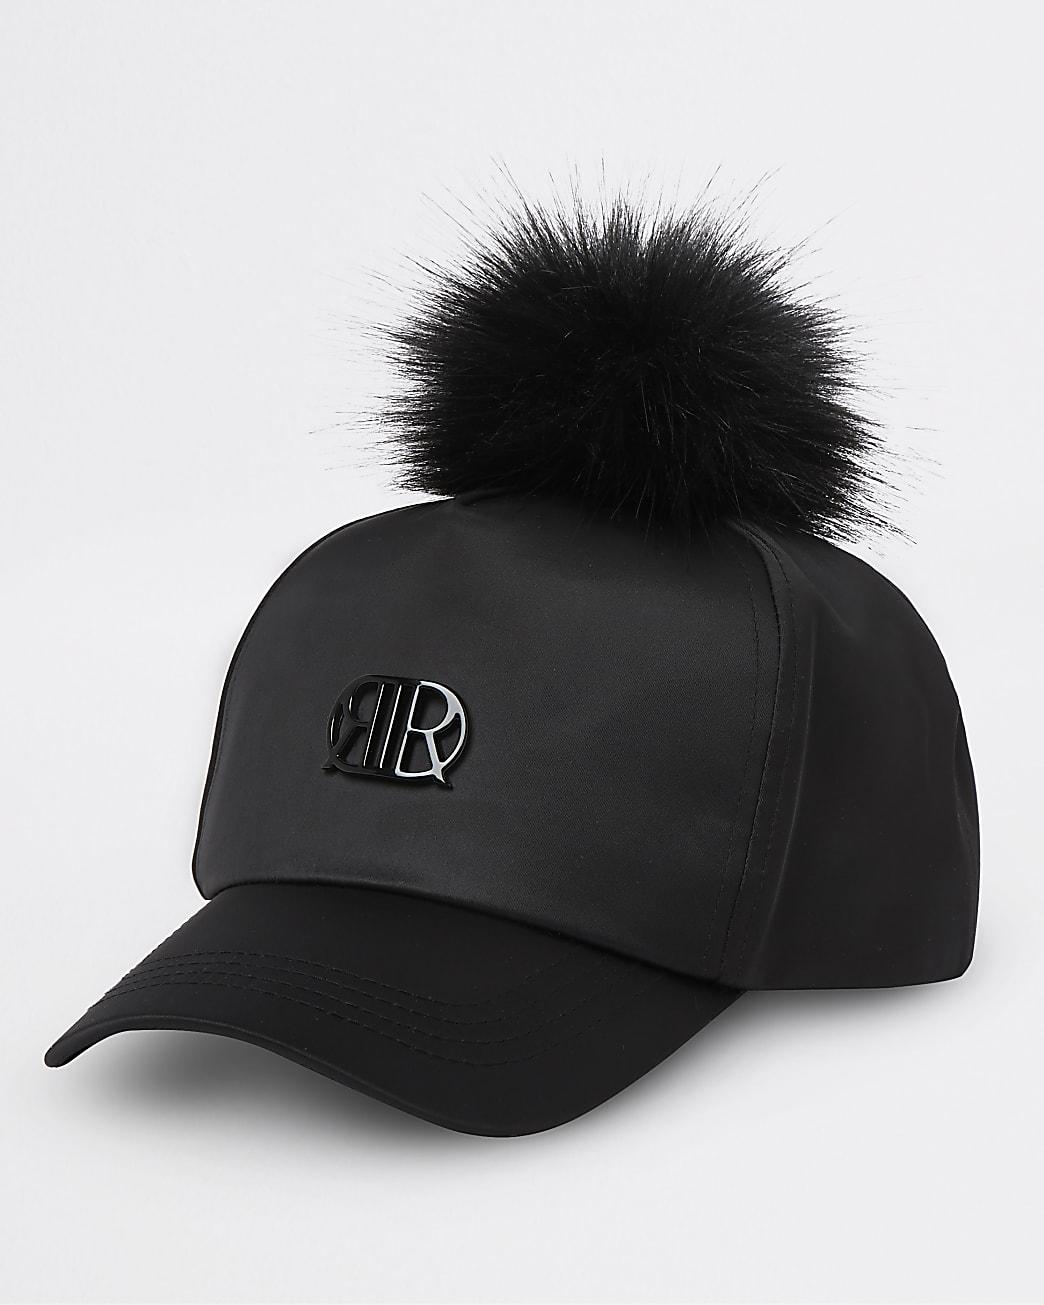 Girls black RIR satin pom pom cap